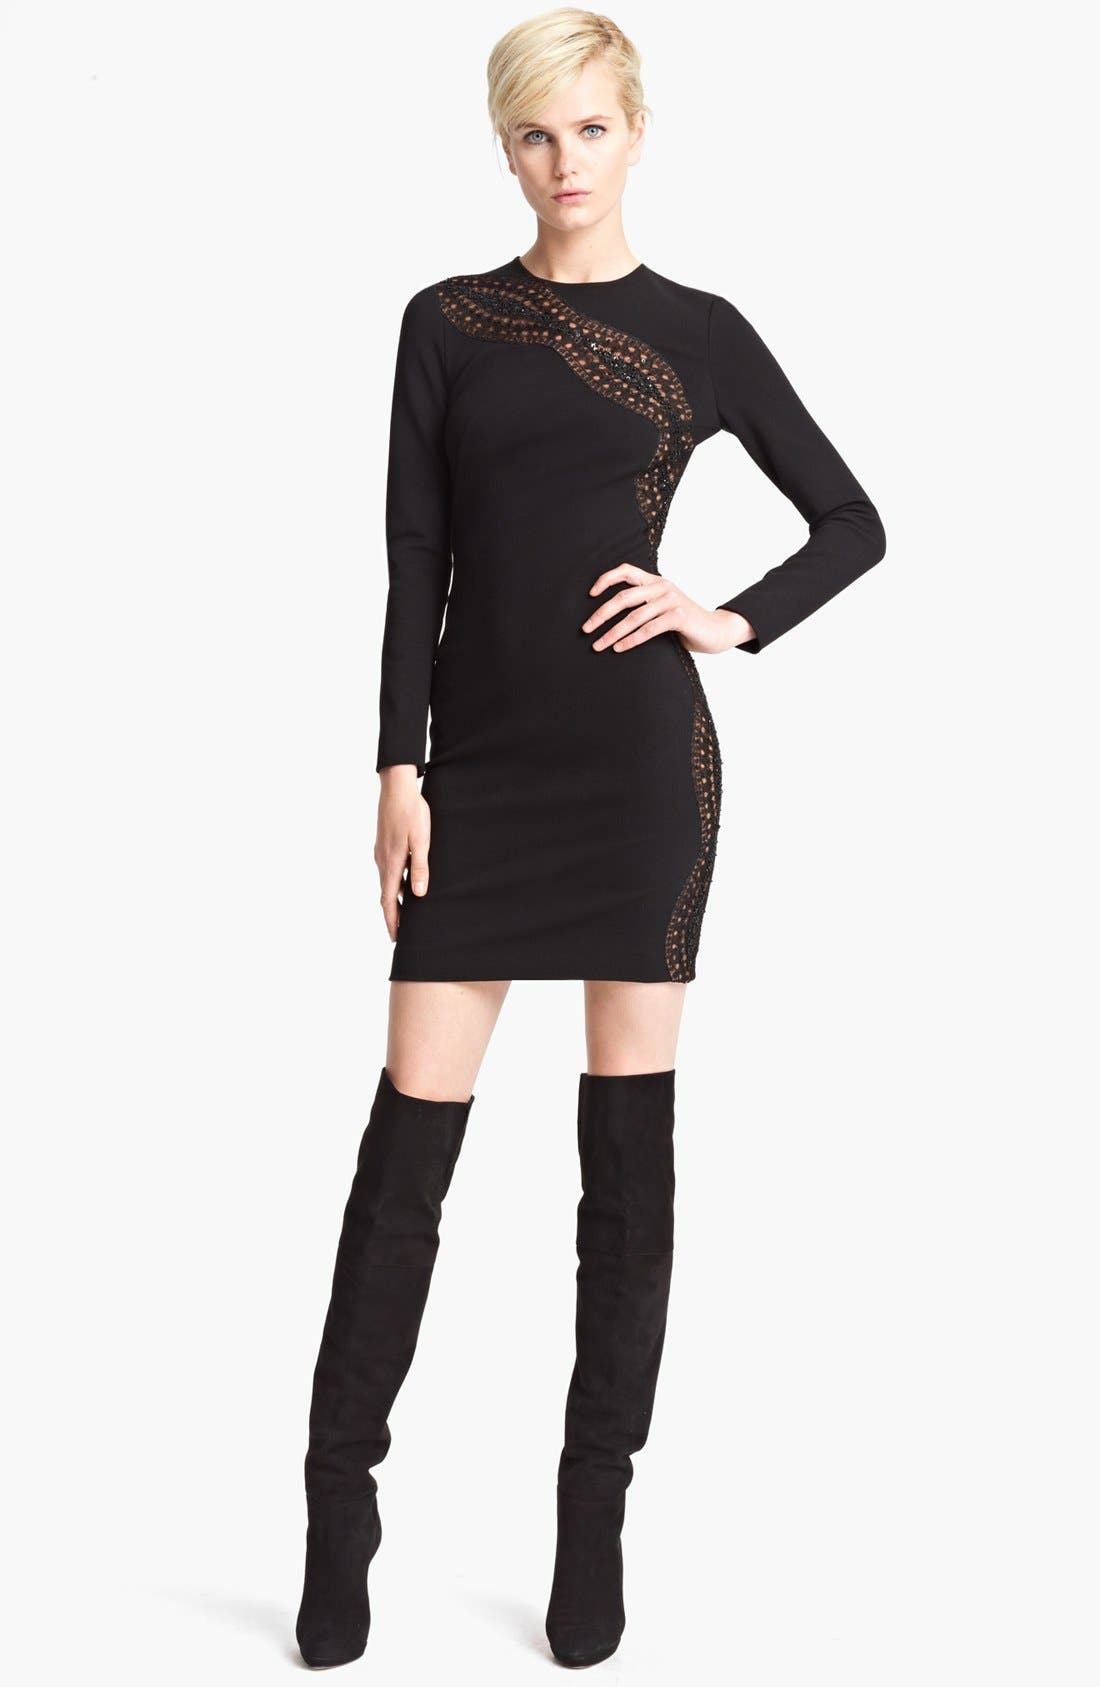 Main Image - Emilio Pucci Embroidered Punto Milano Dress